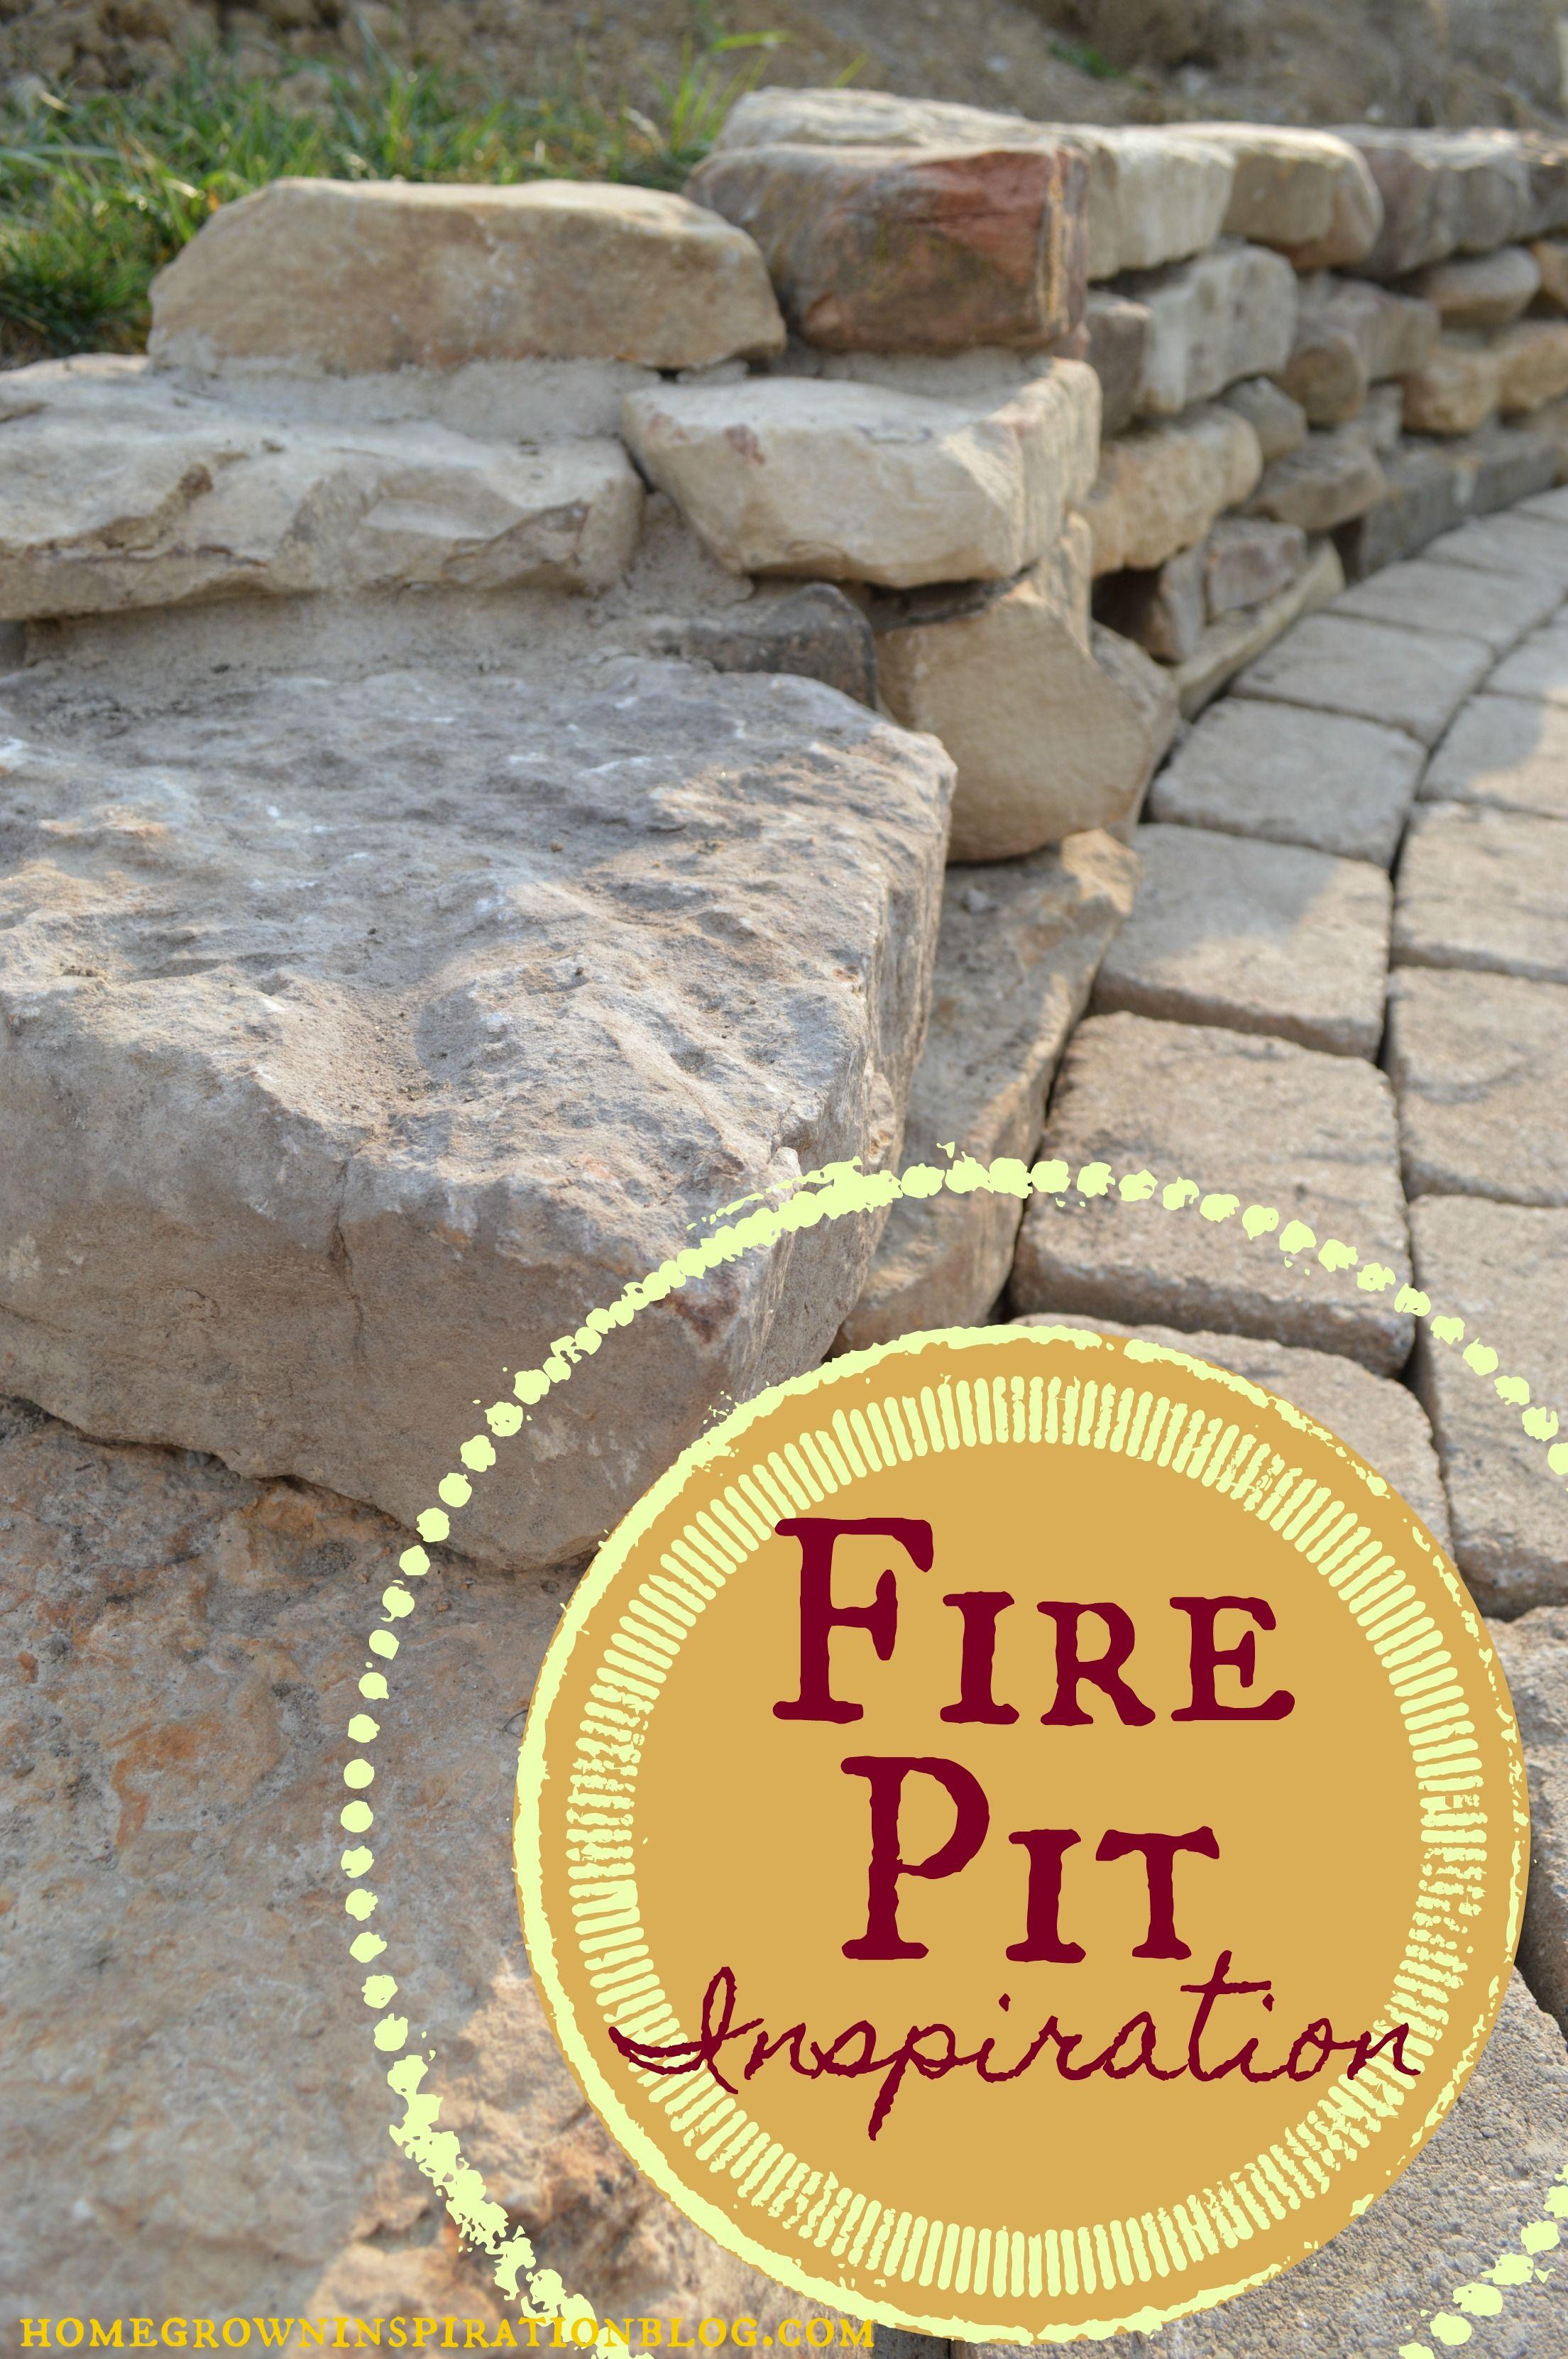 Fire Pit Ideas   Fire pit, Fire, Inspiration on Fire Pit Inspiration  id=98198